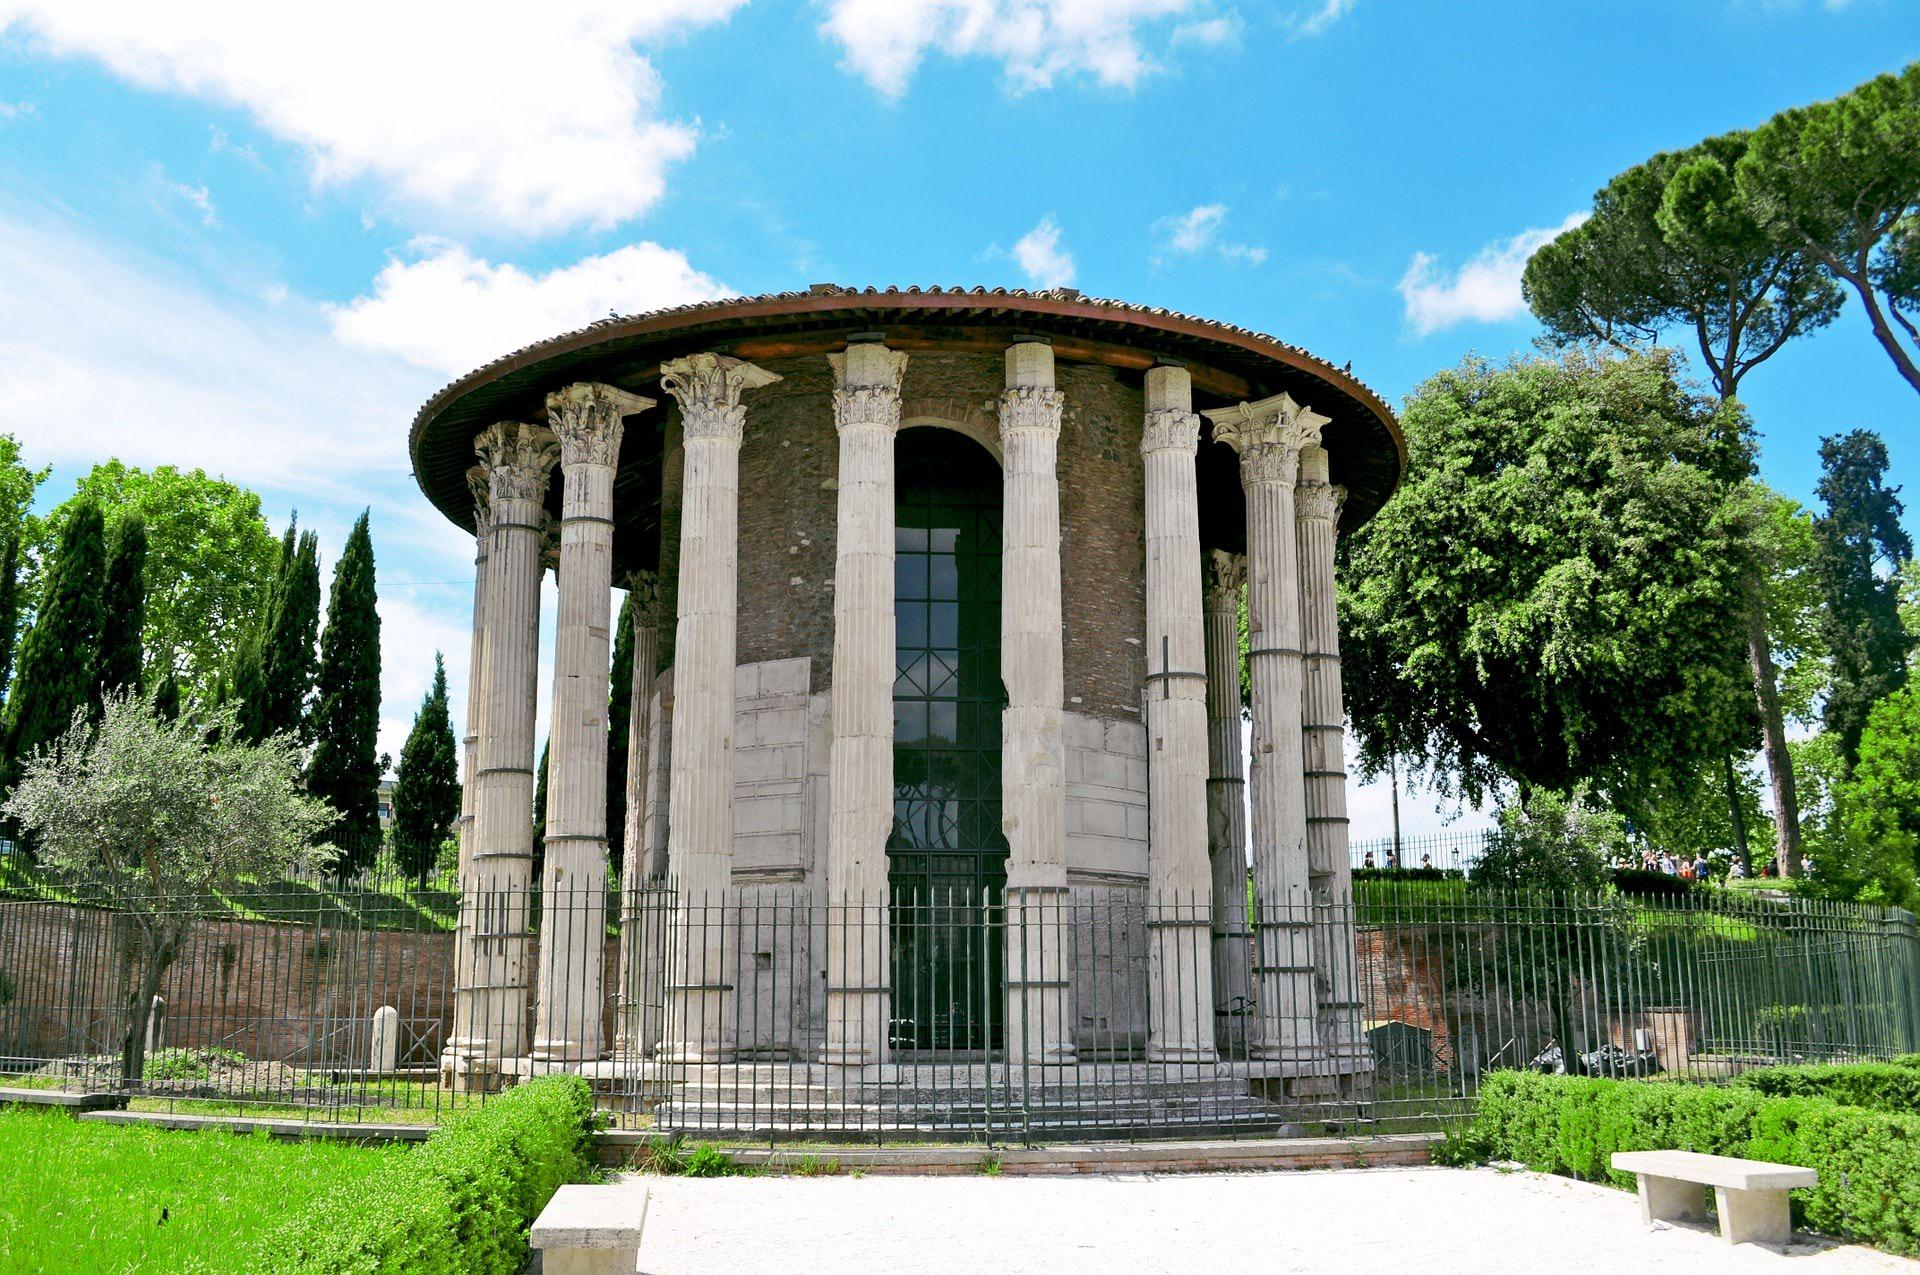 tempio ercole vincitore olivario